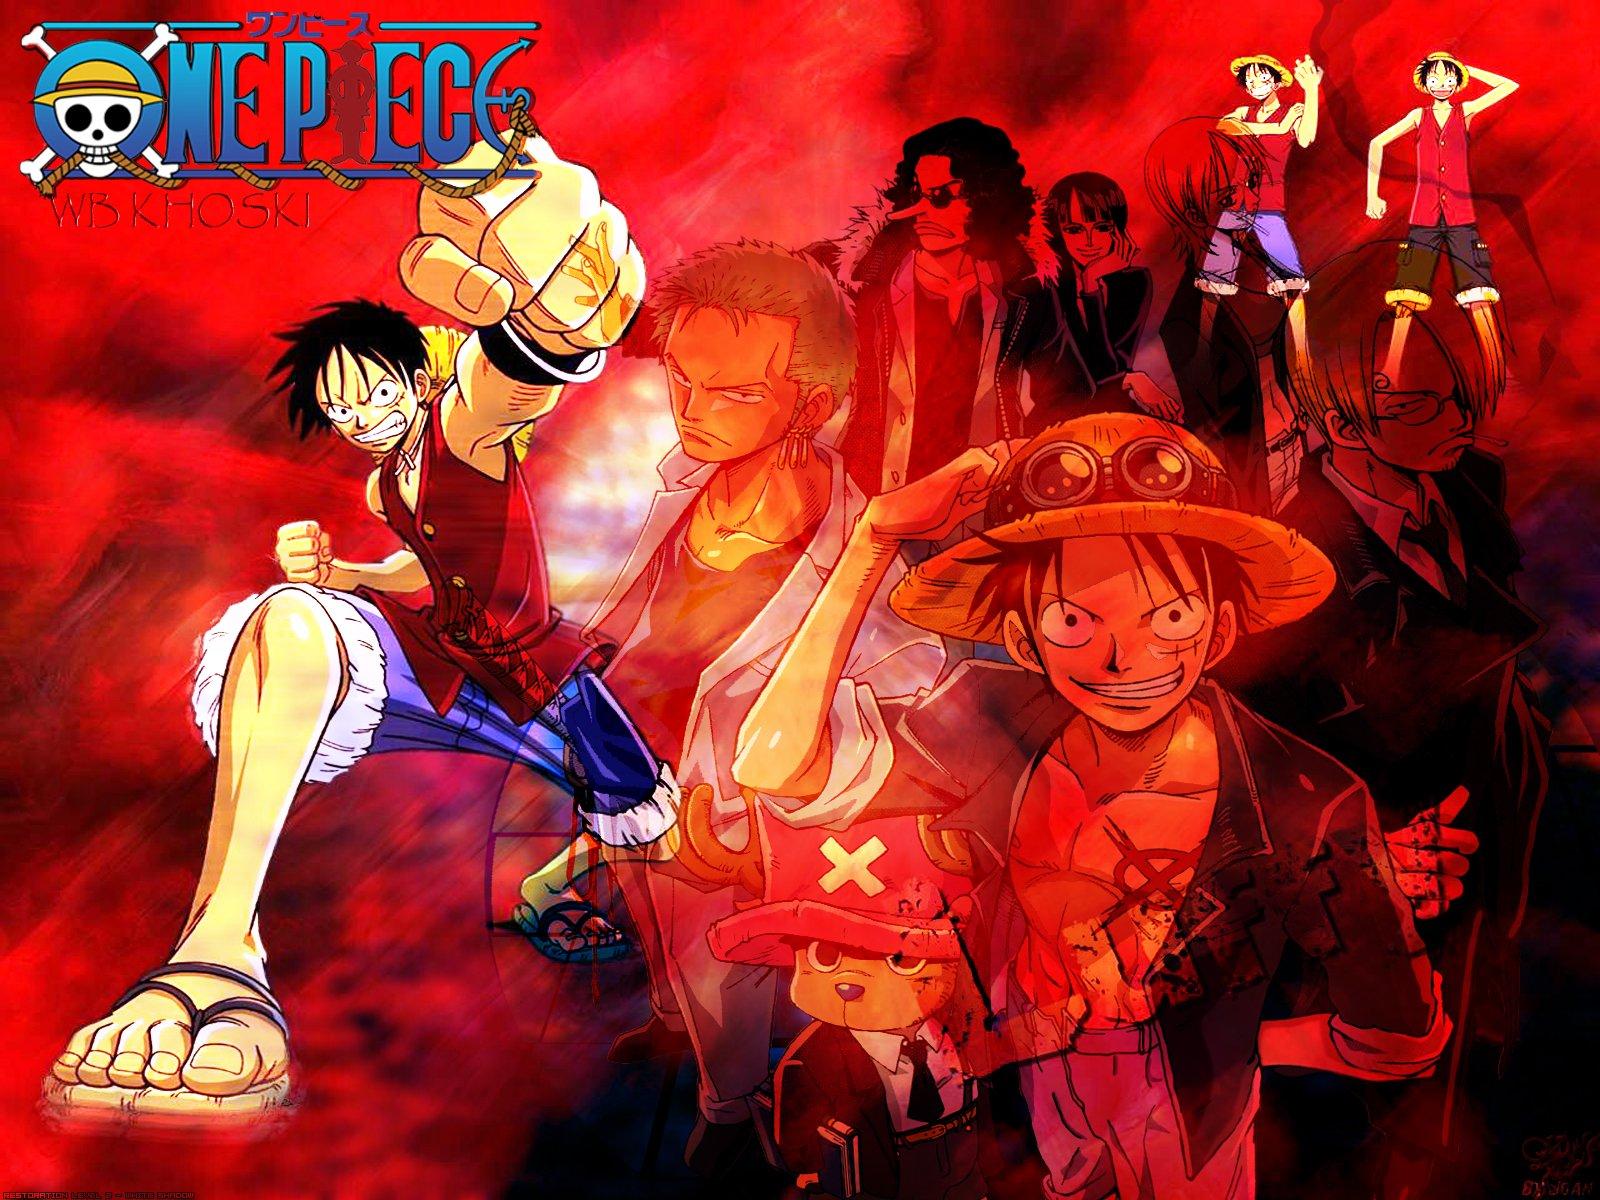 One Piece Hd Wallpaper 1080x1920 Monkey D Luffy And Nakamas One Piece Wb Khoski Fond D